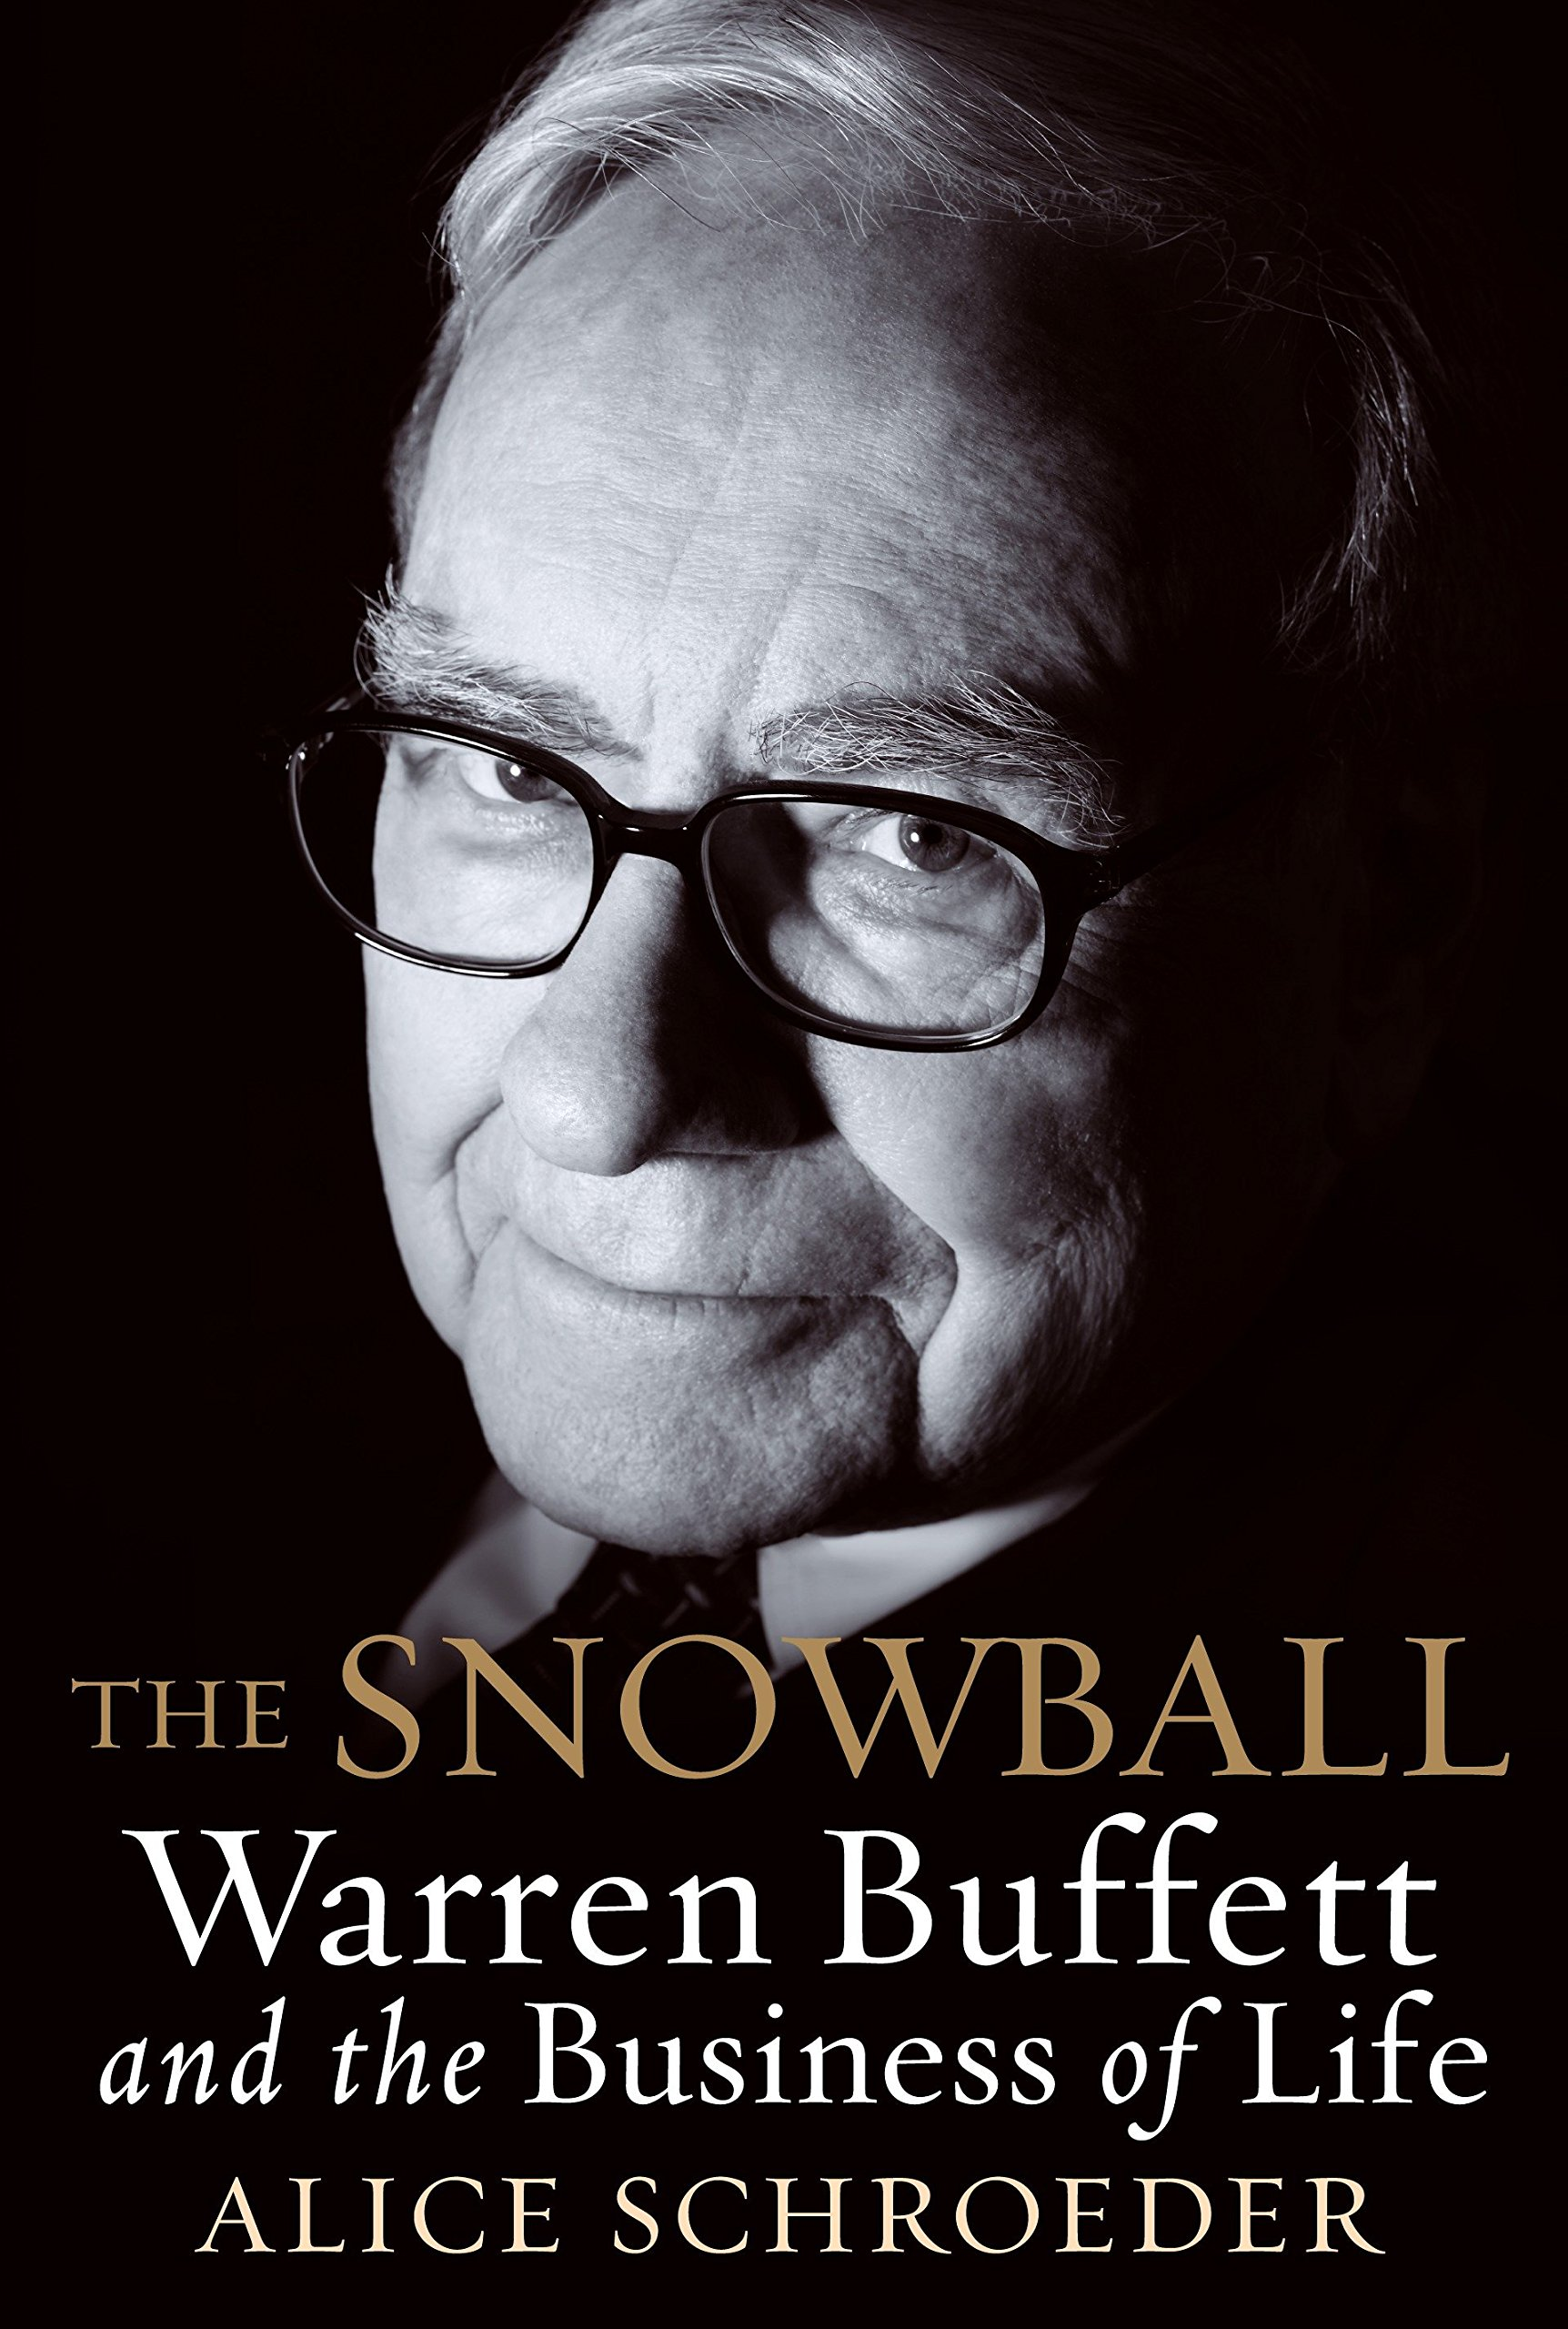 Amazon.com: The Snowball: Warren Buffett and the Business of ...